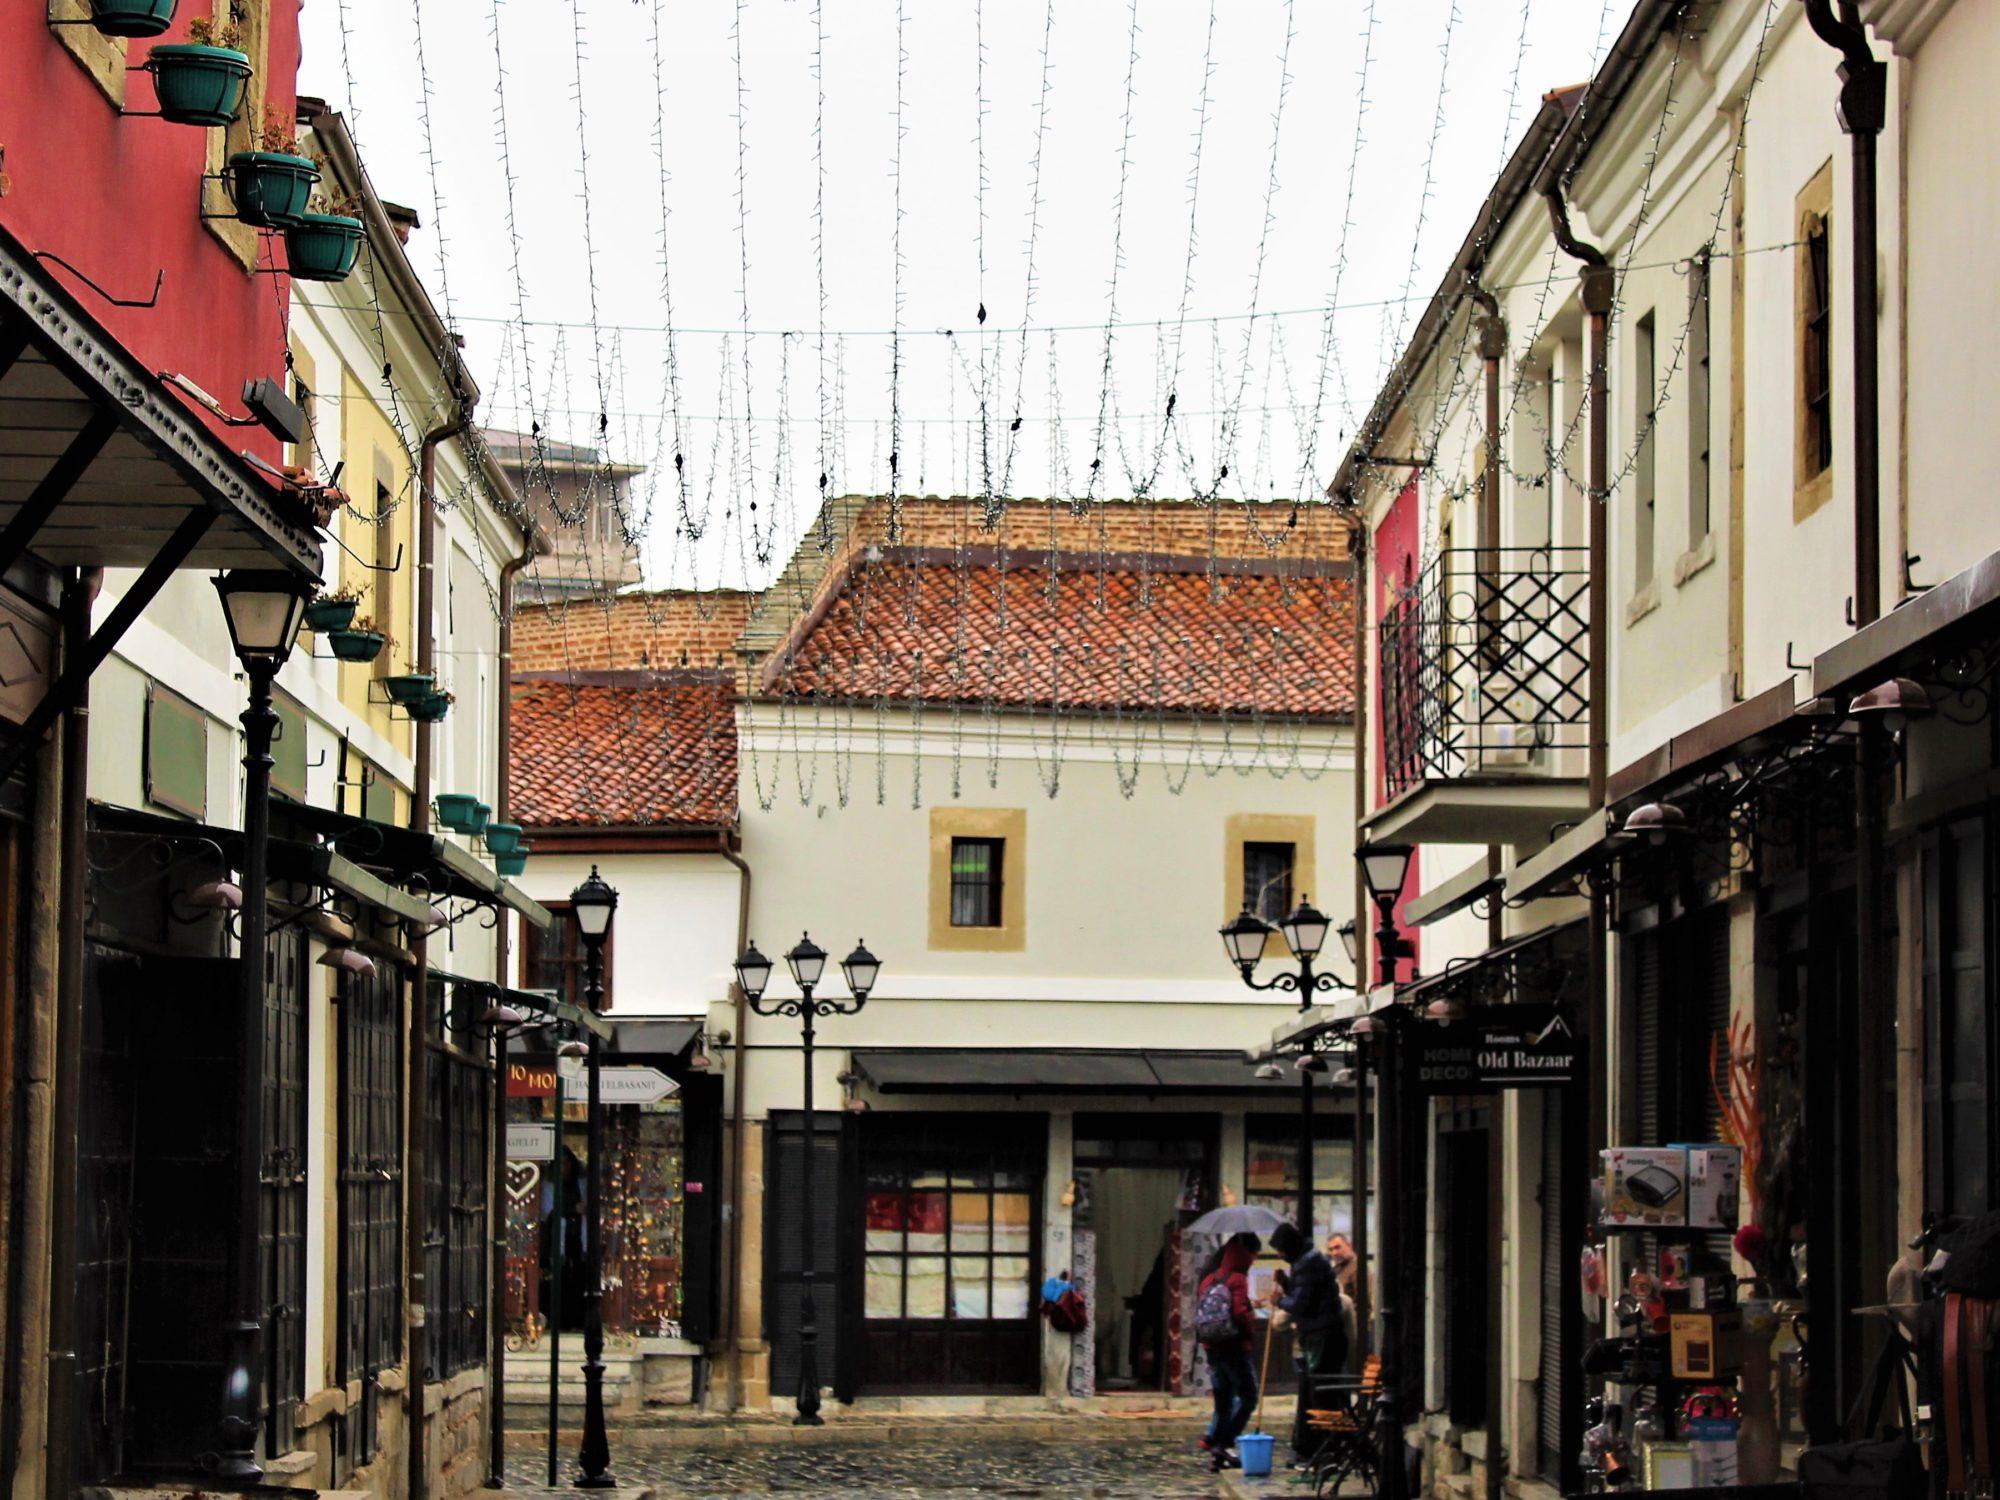 albania korça pazari i vjeter stradina case tipiche